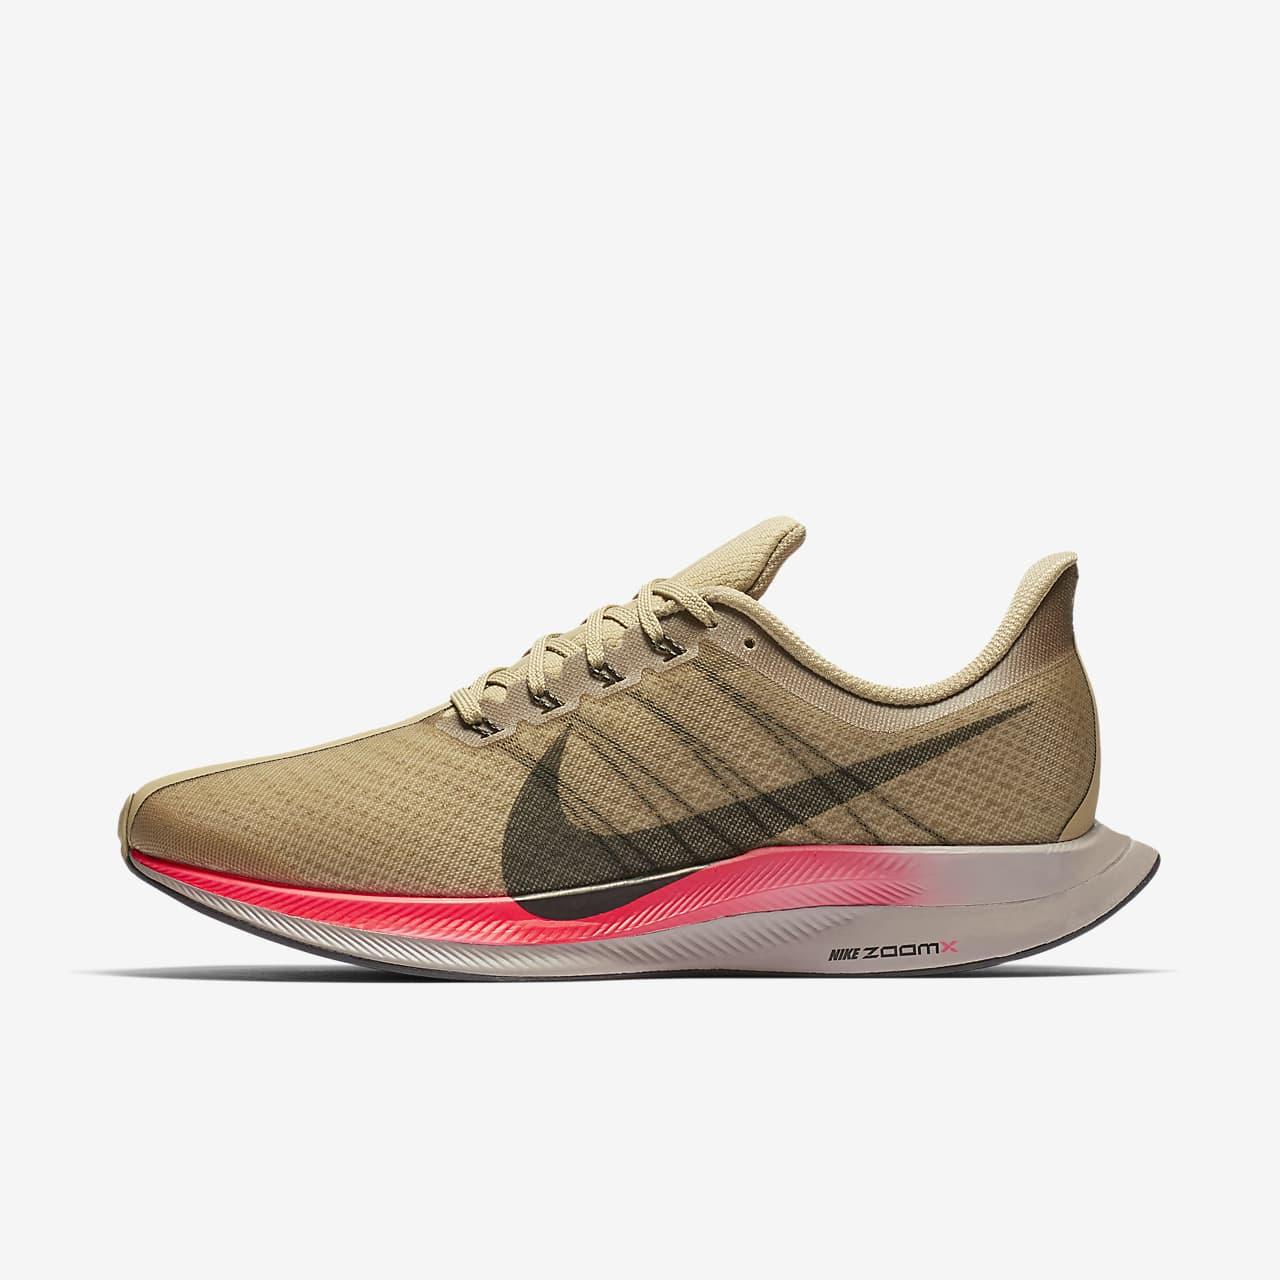 Quagga Abreviatura Artes literarias  Nike Zoom Pegasus 35 Turbo Men's Running Shoe. Nike ID